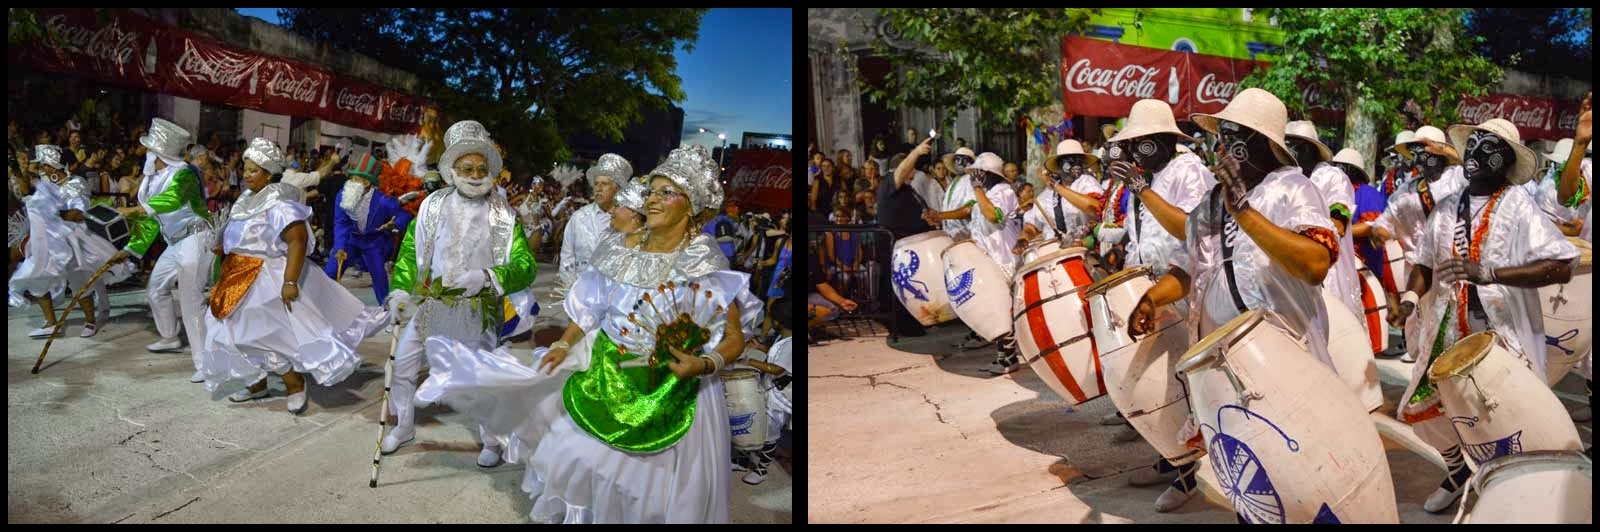 Carnaval. Desfile de Llamadas. Cuareim Diezochenta.